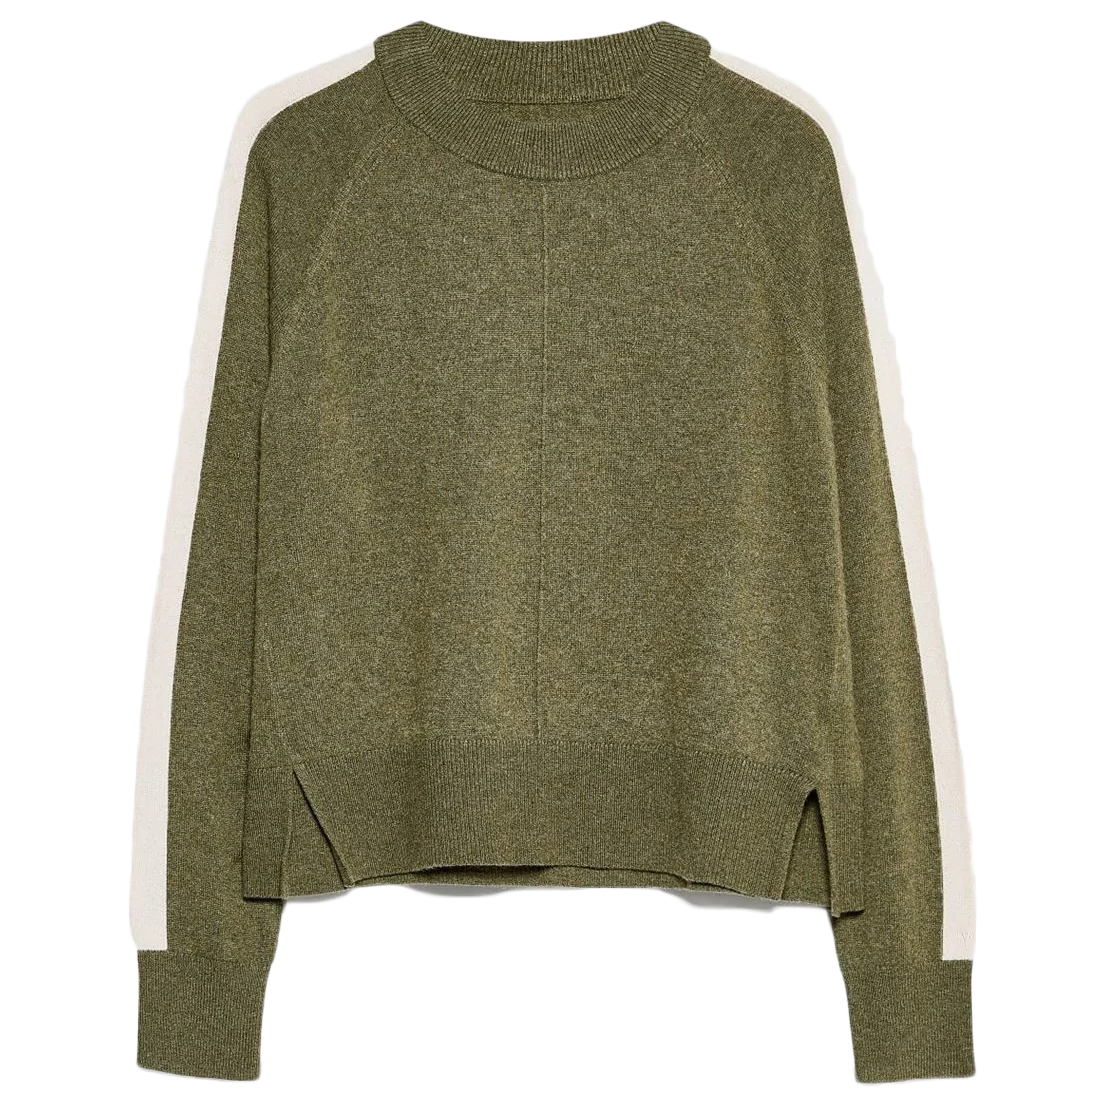 Jack Wills Women's Holyroyd Contrast Stripe Crewneck Sweater - Green, 10